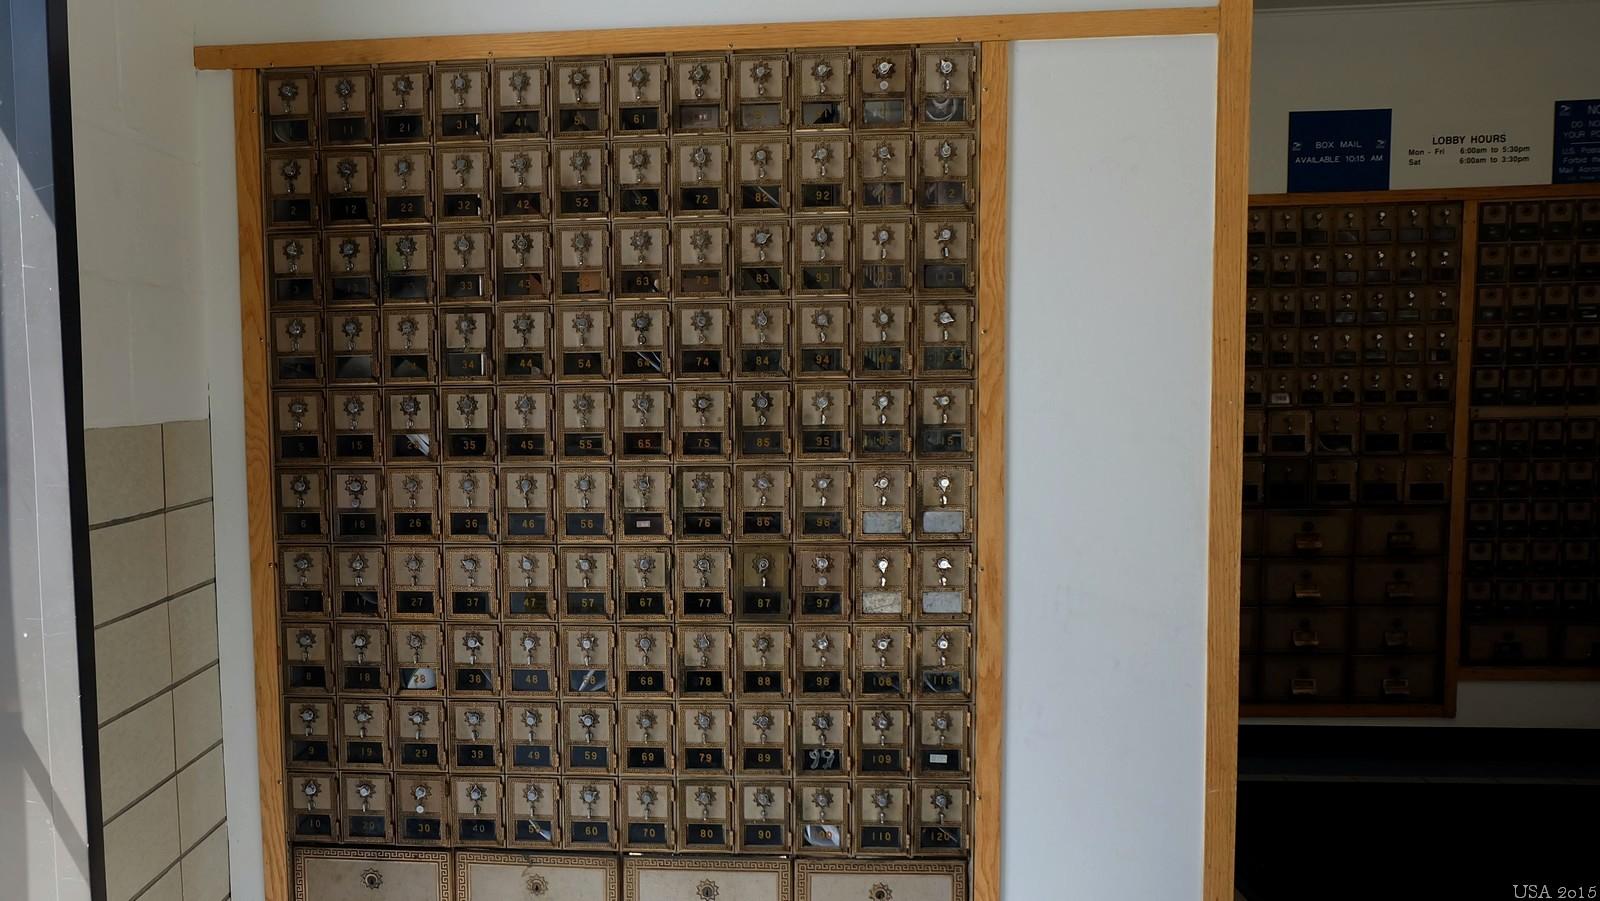 Post Office, Maynard, MA, USA